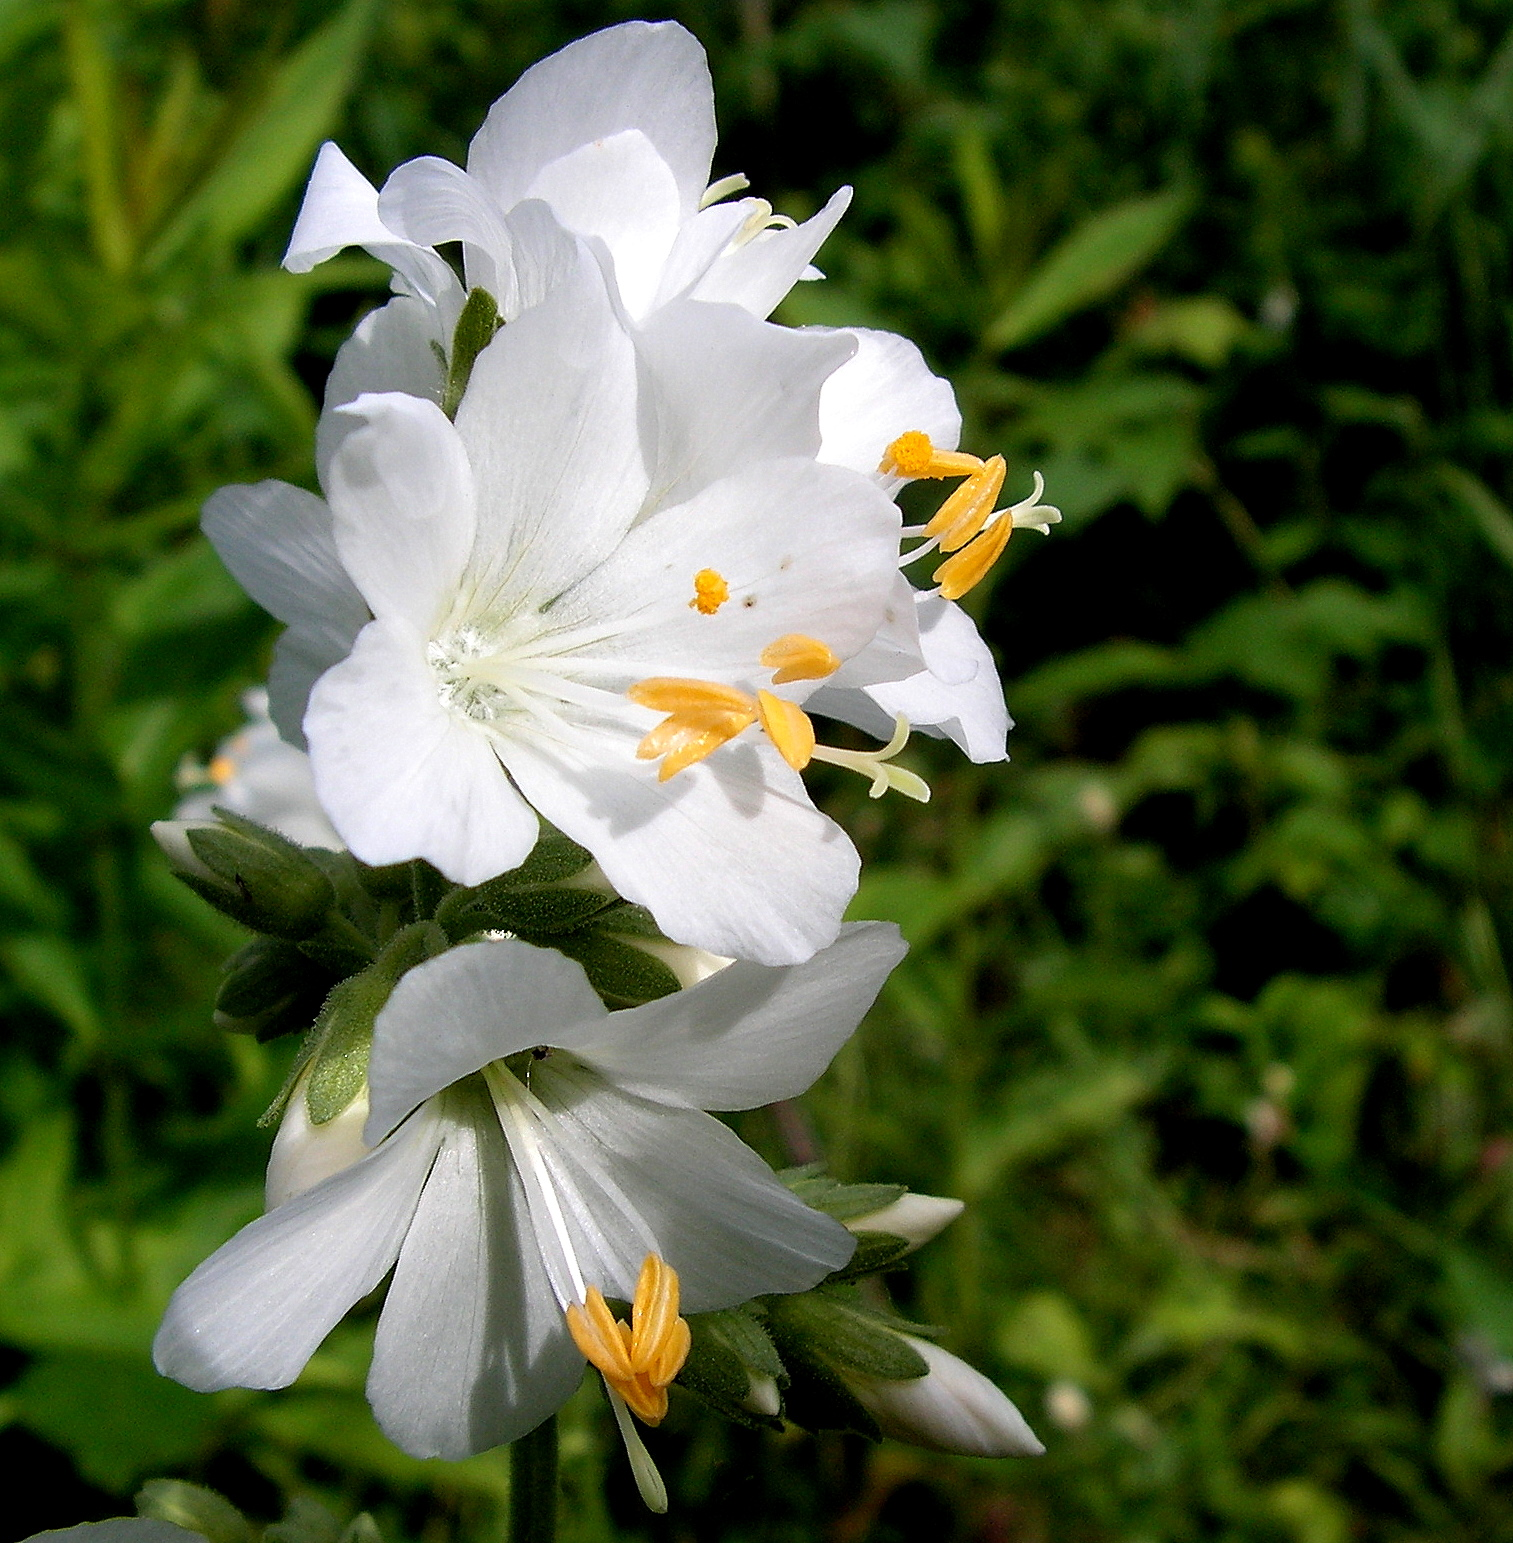 Pretty White Flower by JocelyneR